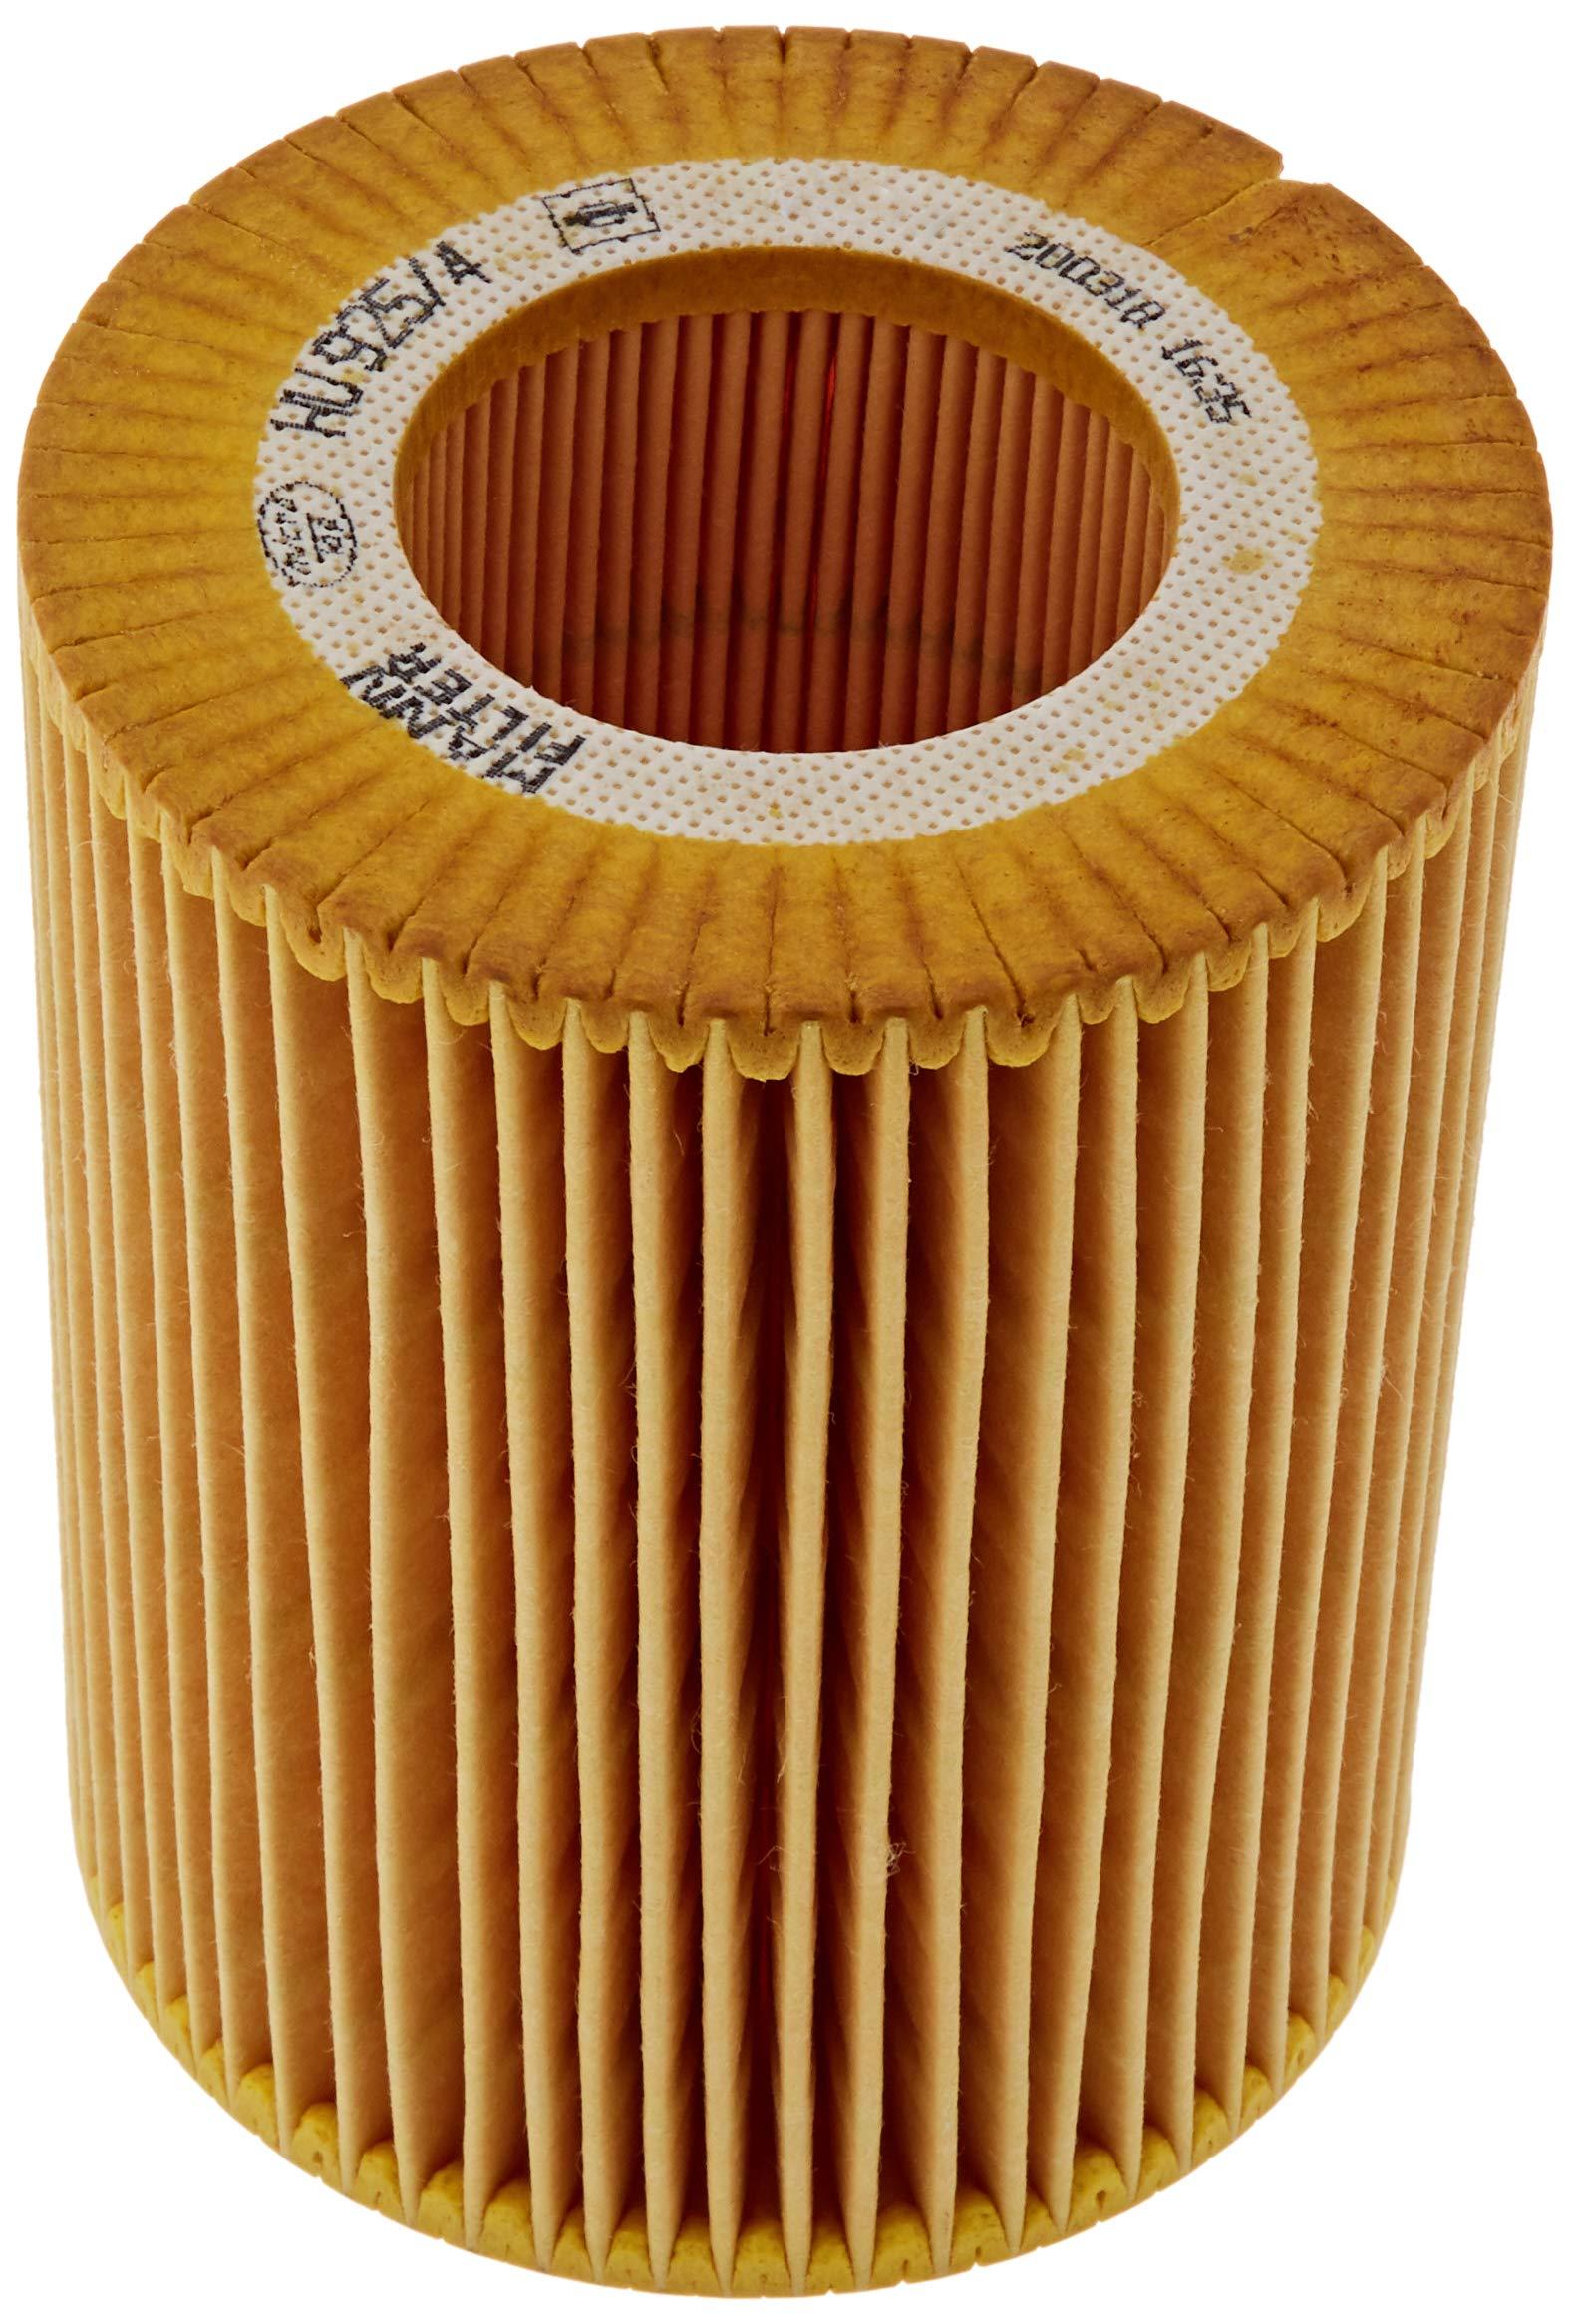 Mann-Filter HU 925/4 Y Metal-Free Oil Filter